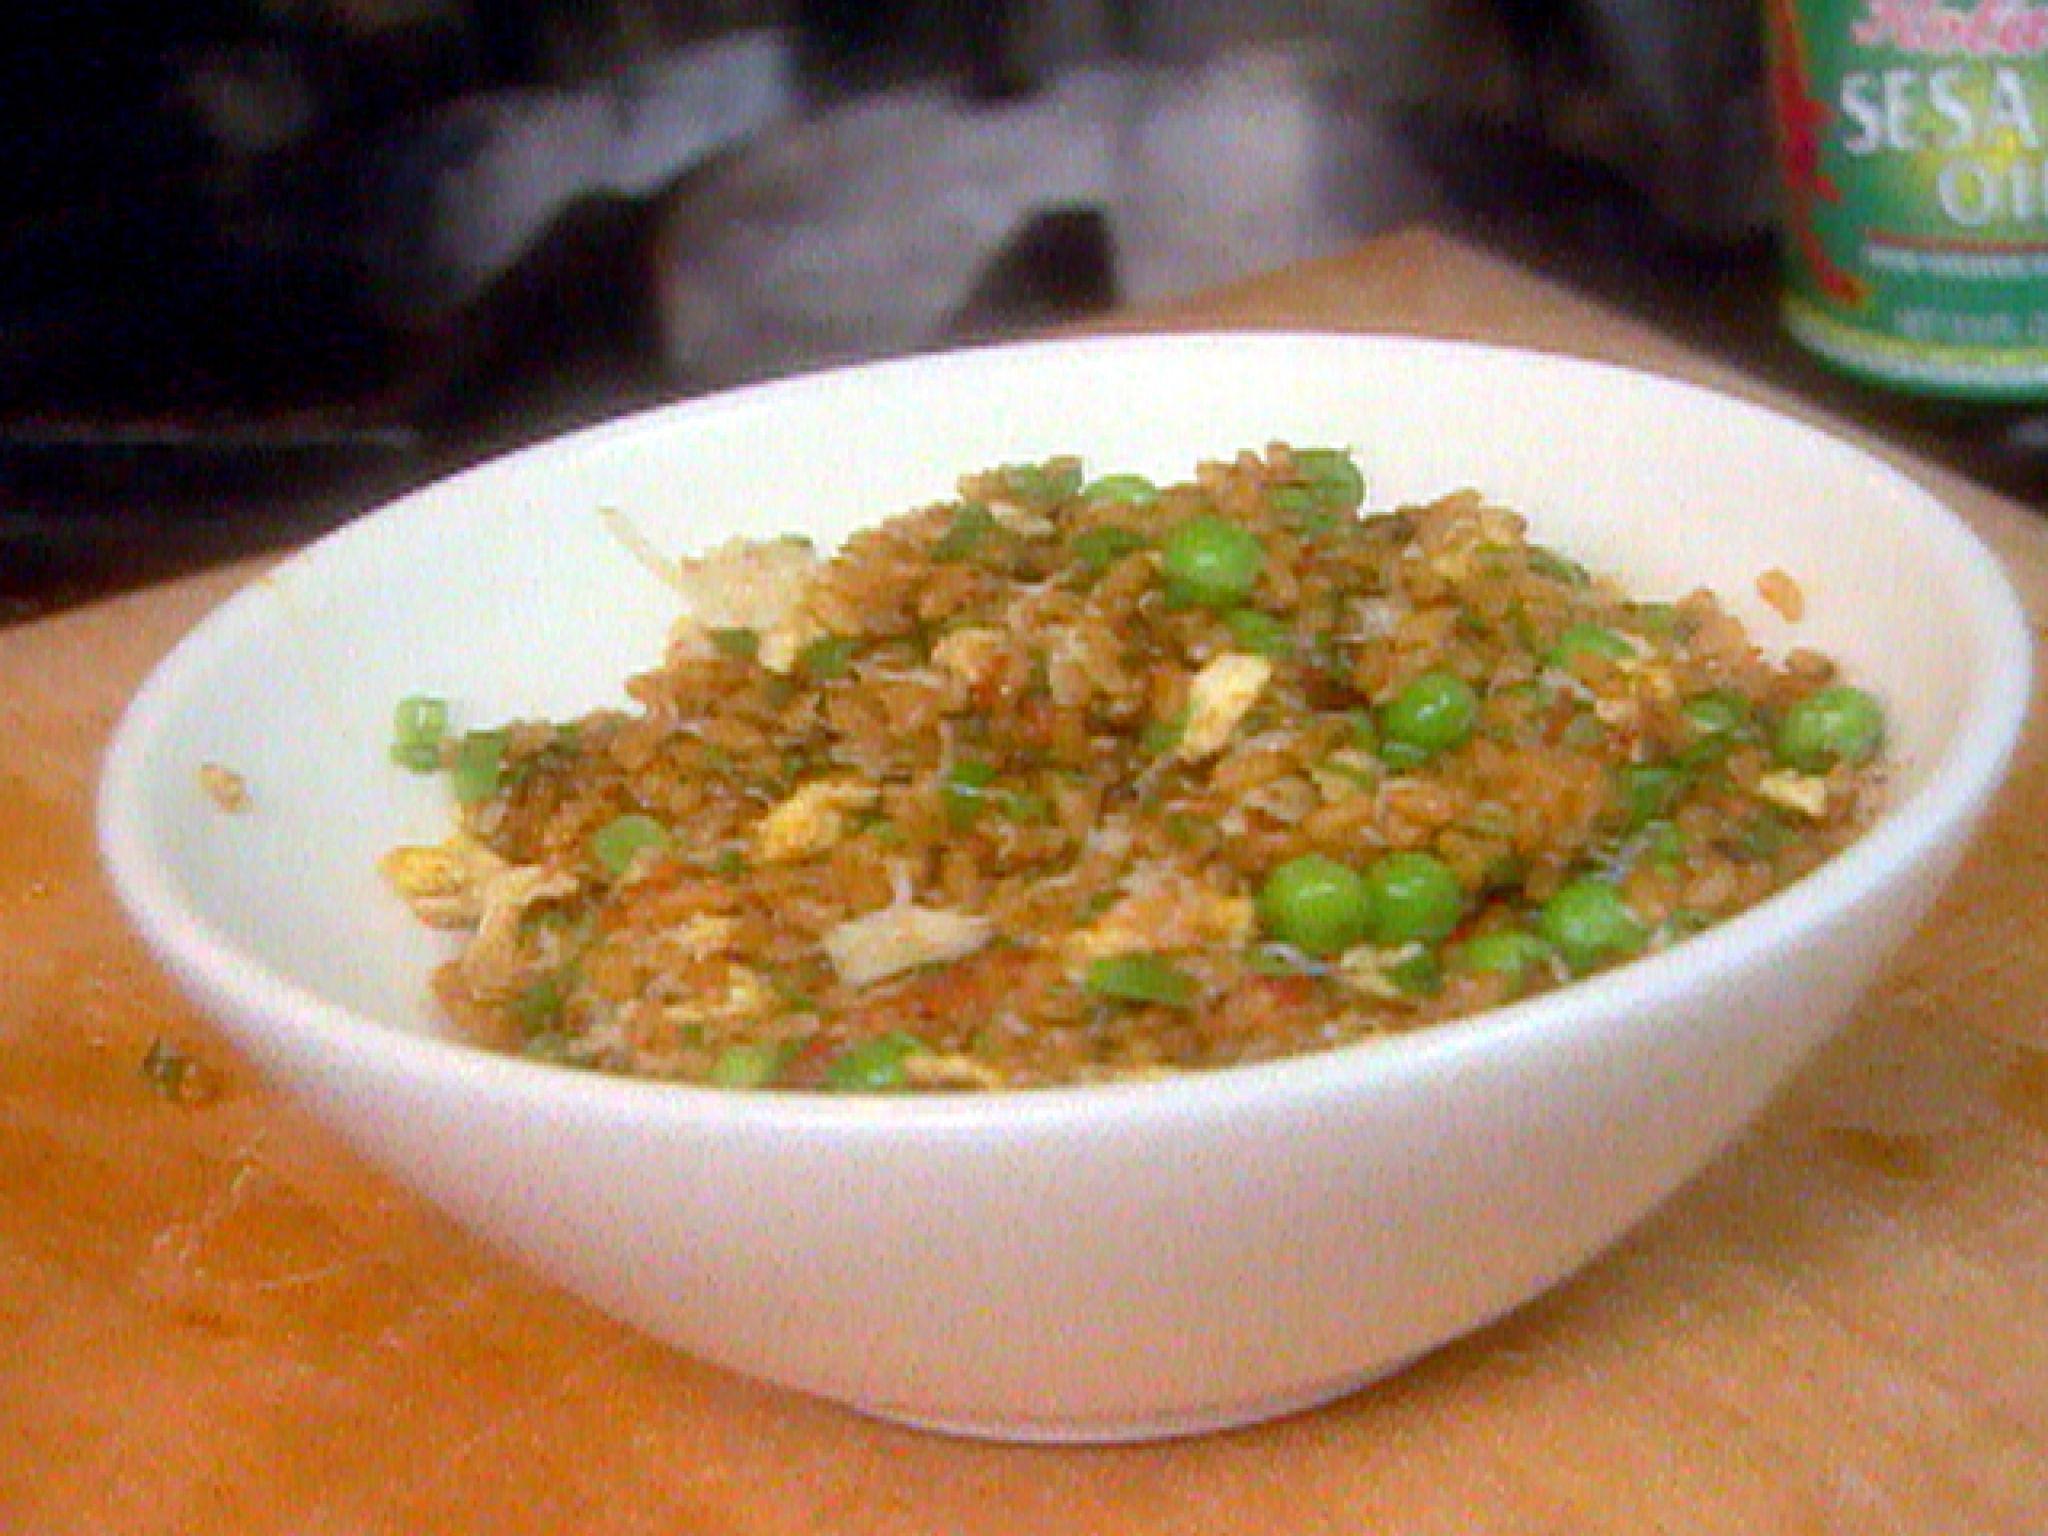 Dragonfly stir fry rice recipe stir fried rice recipe stir food dragonfly stir fry rice recipe forumfinder Gallery